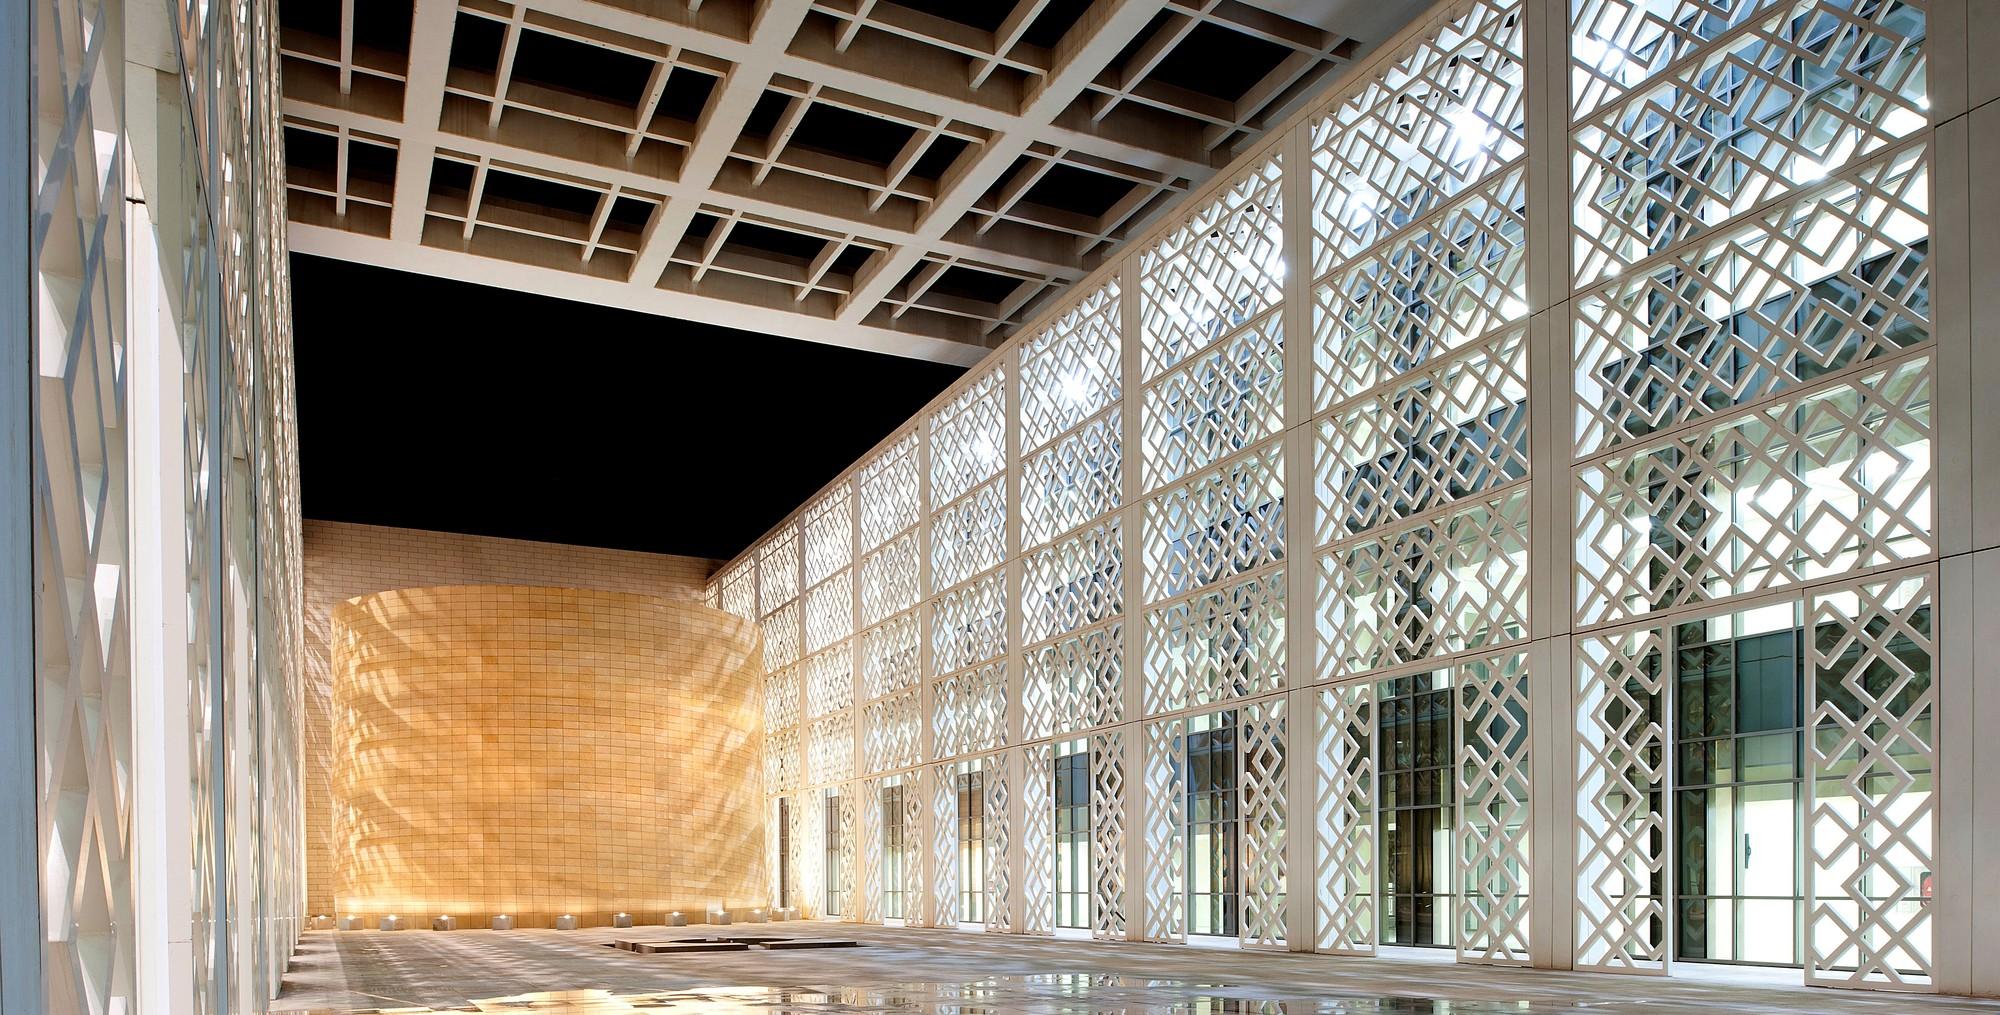 Princess nora bint abdulrahman university perkins will for Architecture firms in qatar